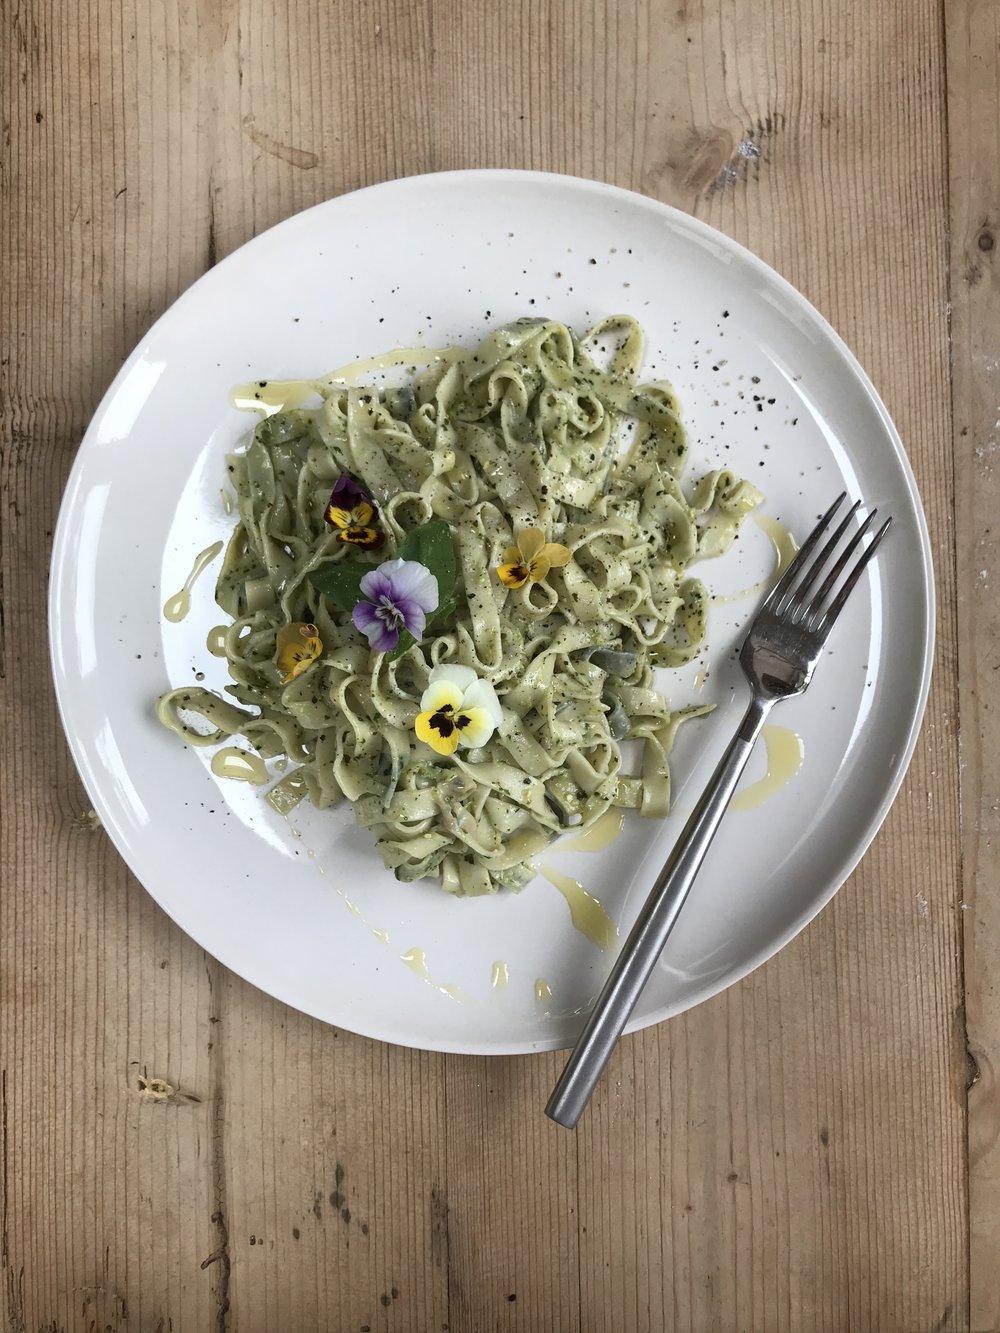 Fresh pasta, fresh pesto with edible flowers